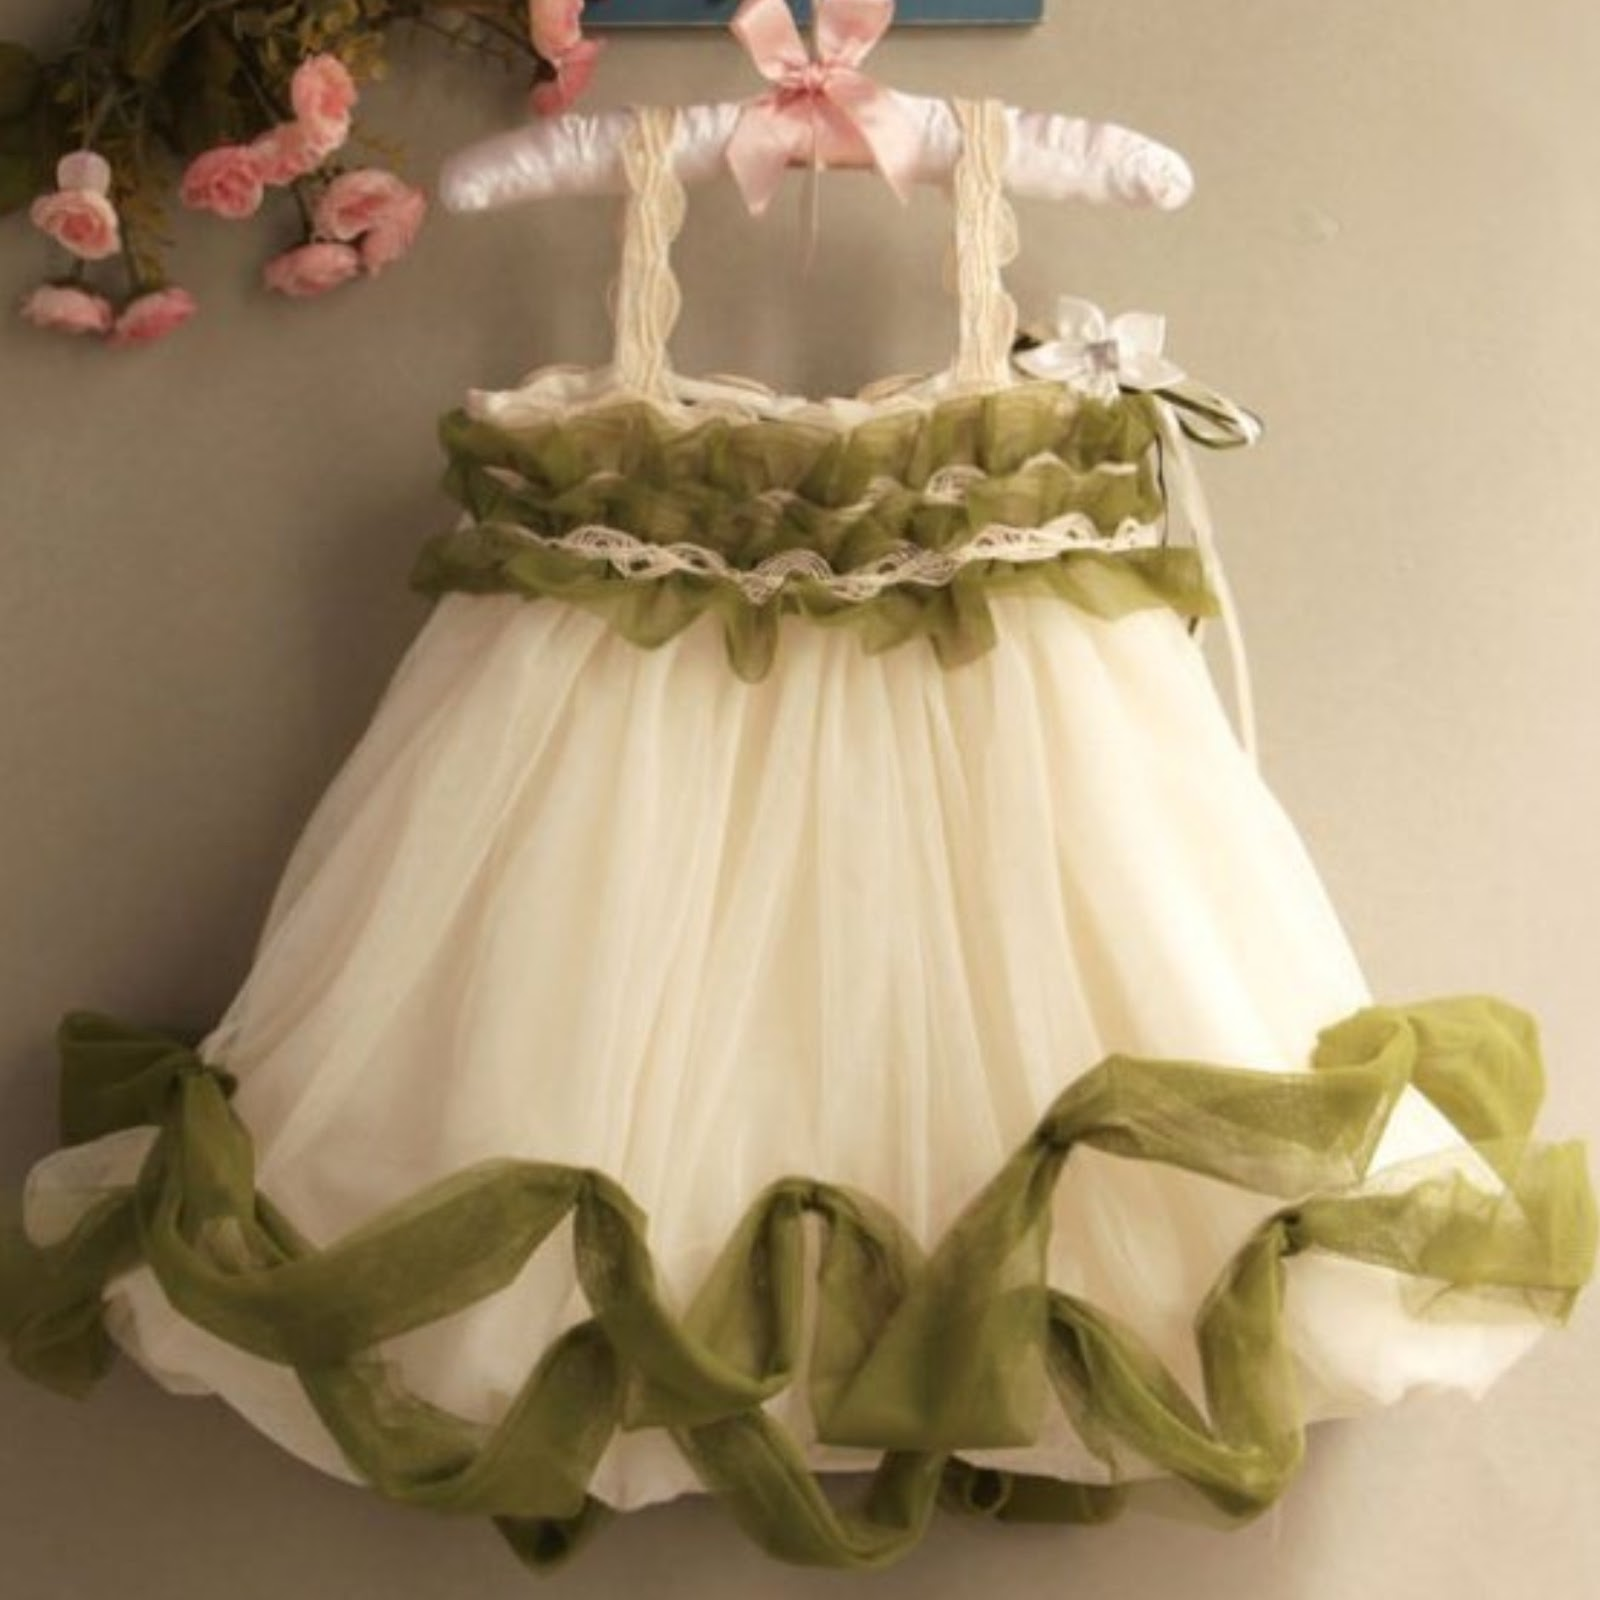 dress pesta anak perempuan princess usia 3 tahun 20 model baju bayi terbaik yang lucu, imut dan menggemaskan,Model Baju Anak Perempuan 7 Bulan